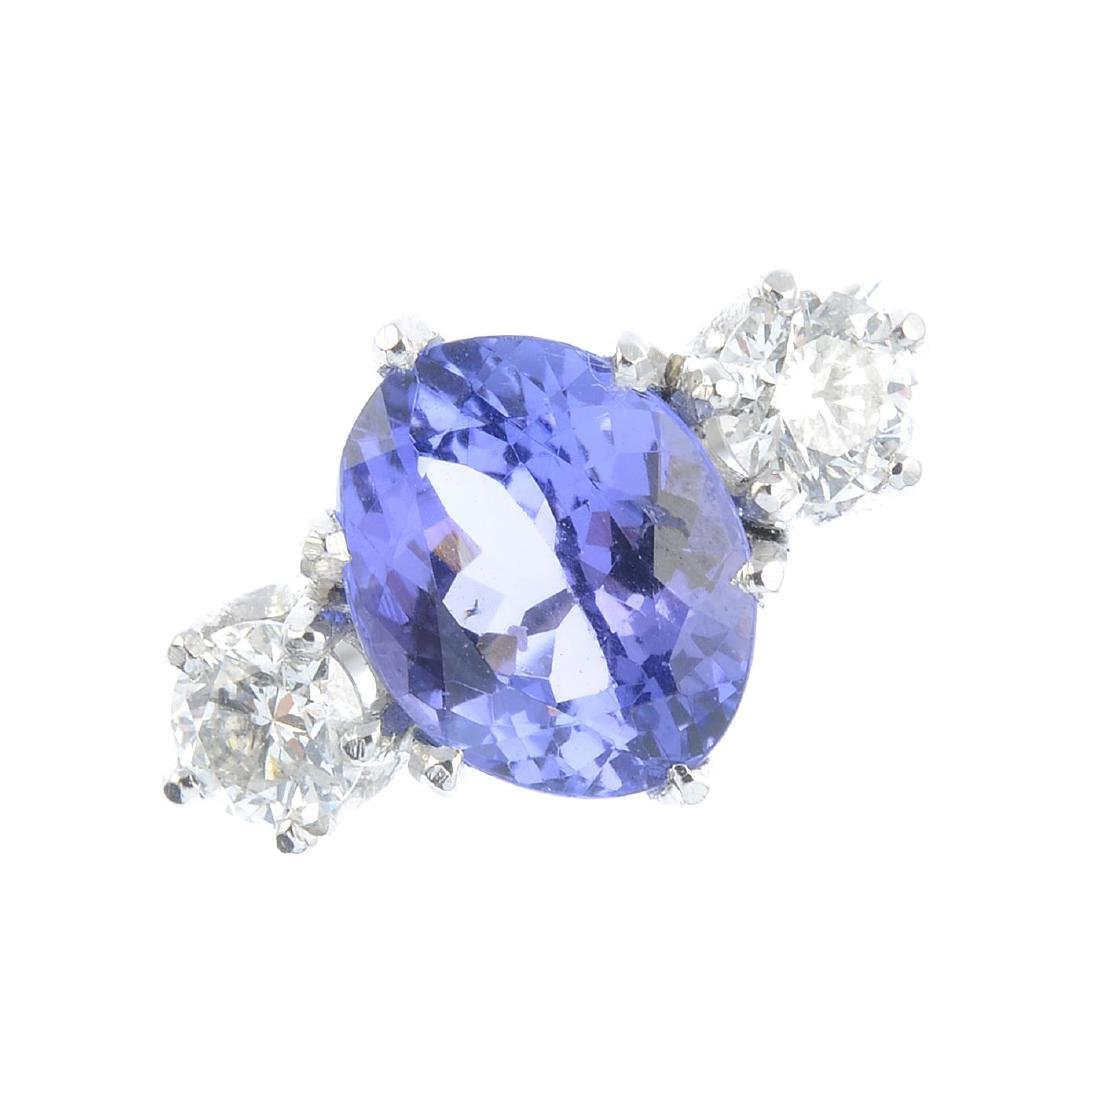 A tanzanite and diamond three-stone ring. The